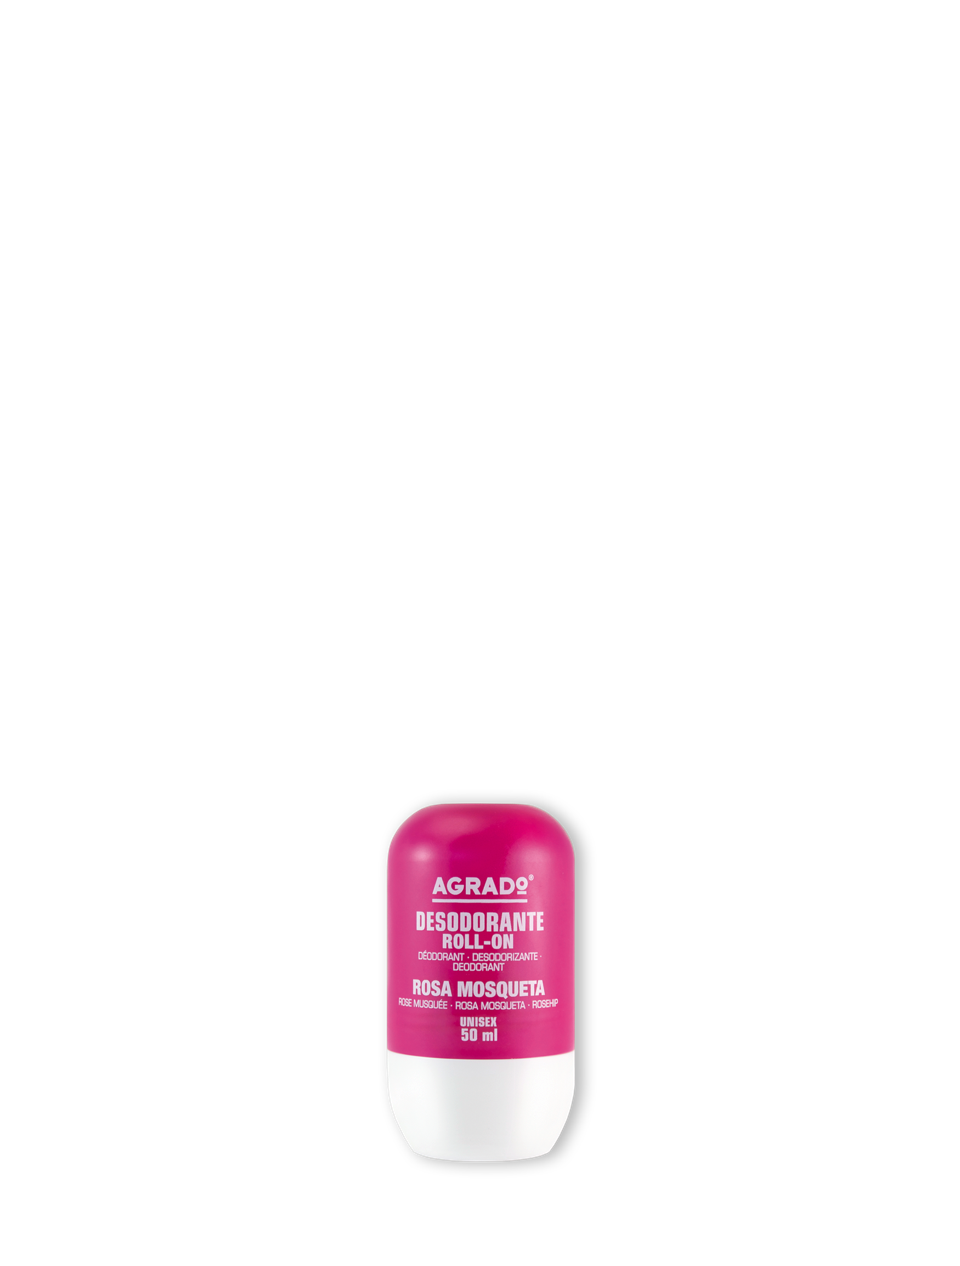 desodorante-roll-on-rosa-mosqueta-agrado-5251